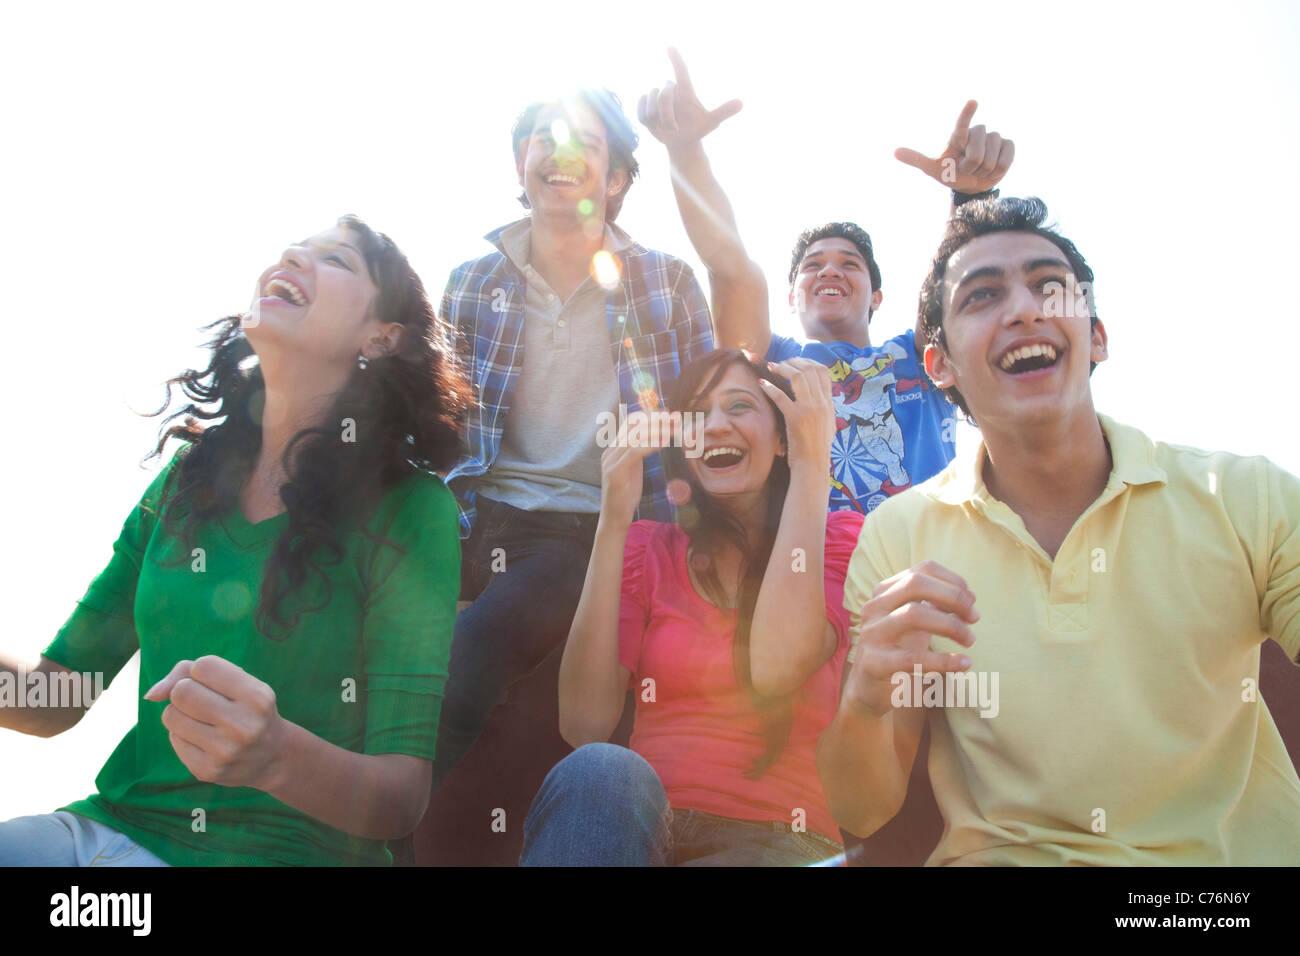 Encourager les jeunes Photo Stock